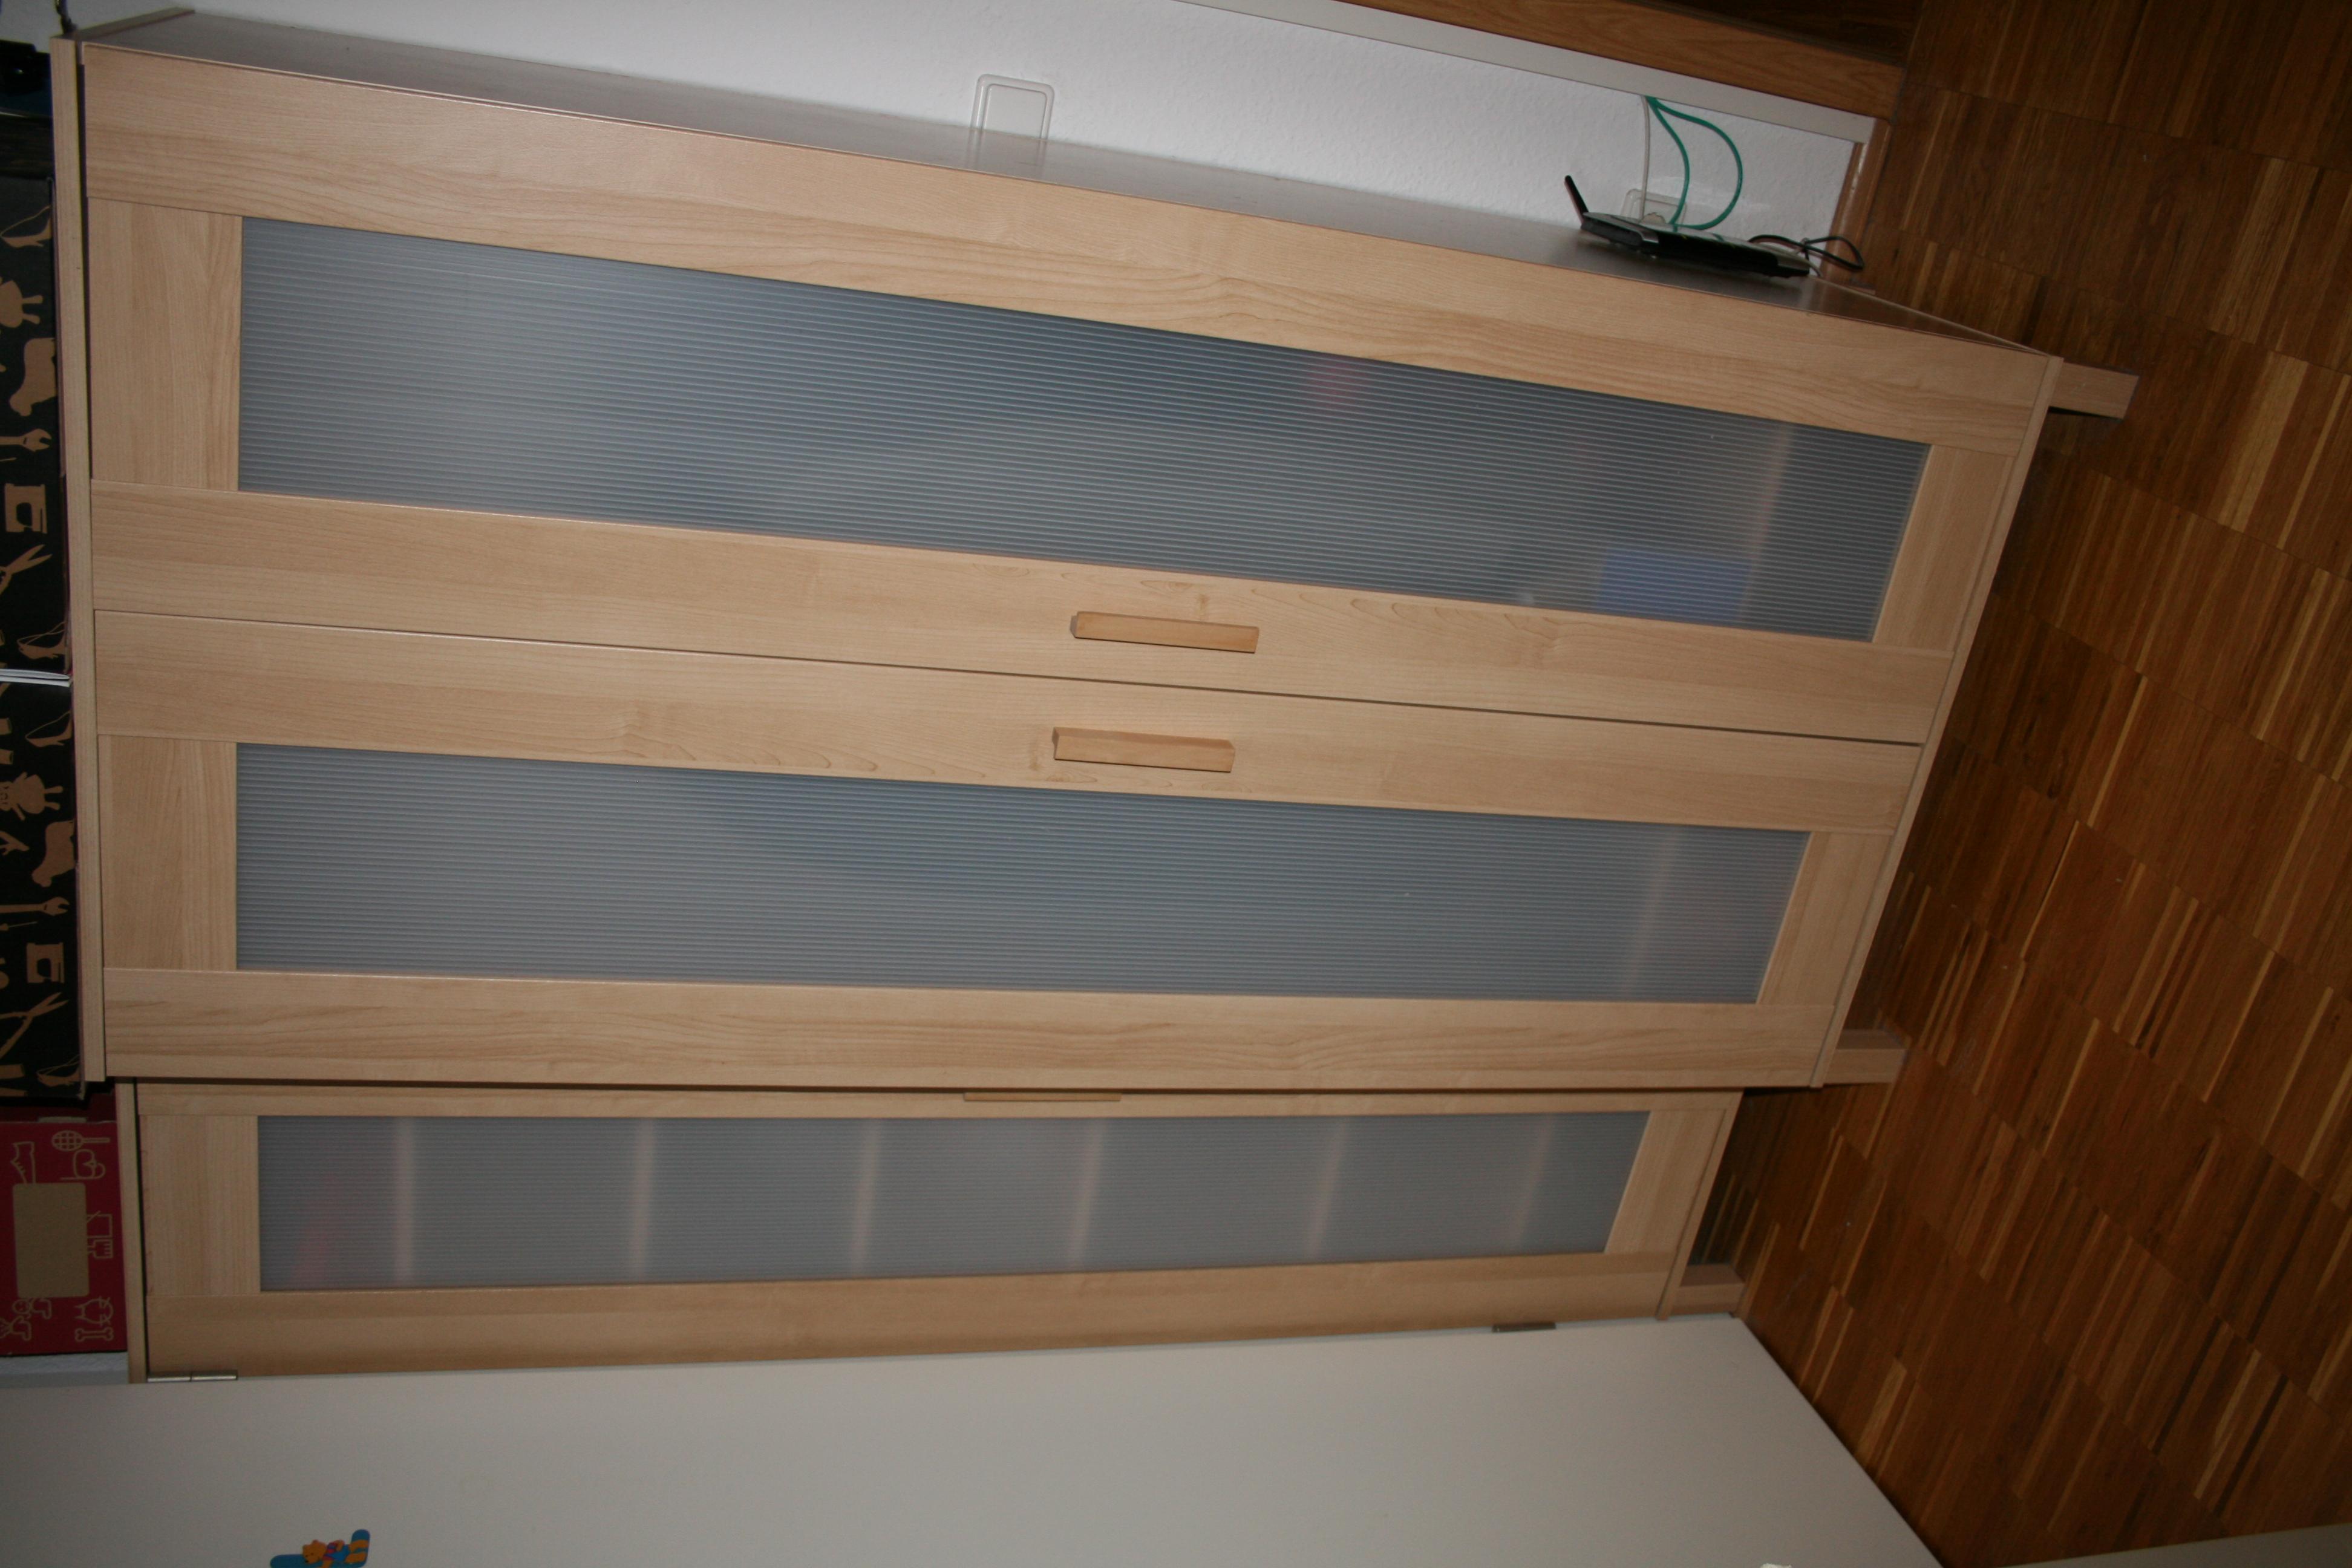 eXma » [verkaufe] Ikea Schrank Aneboda